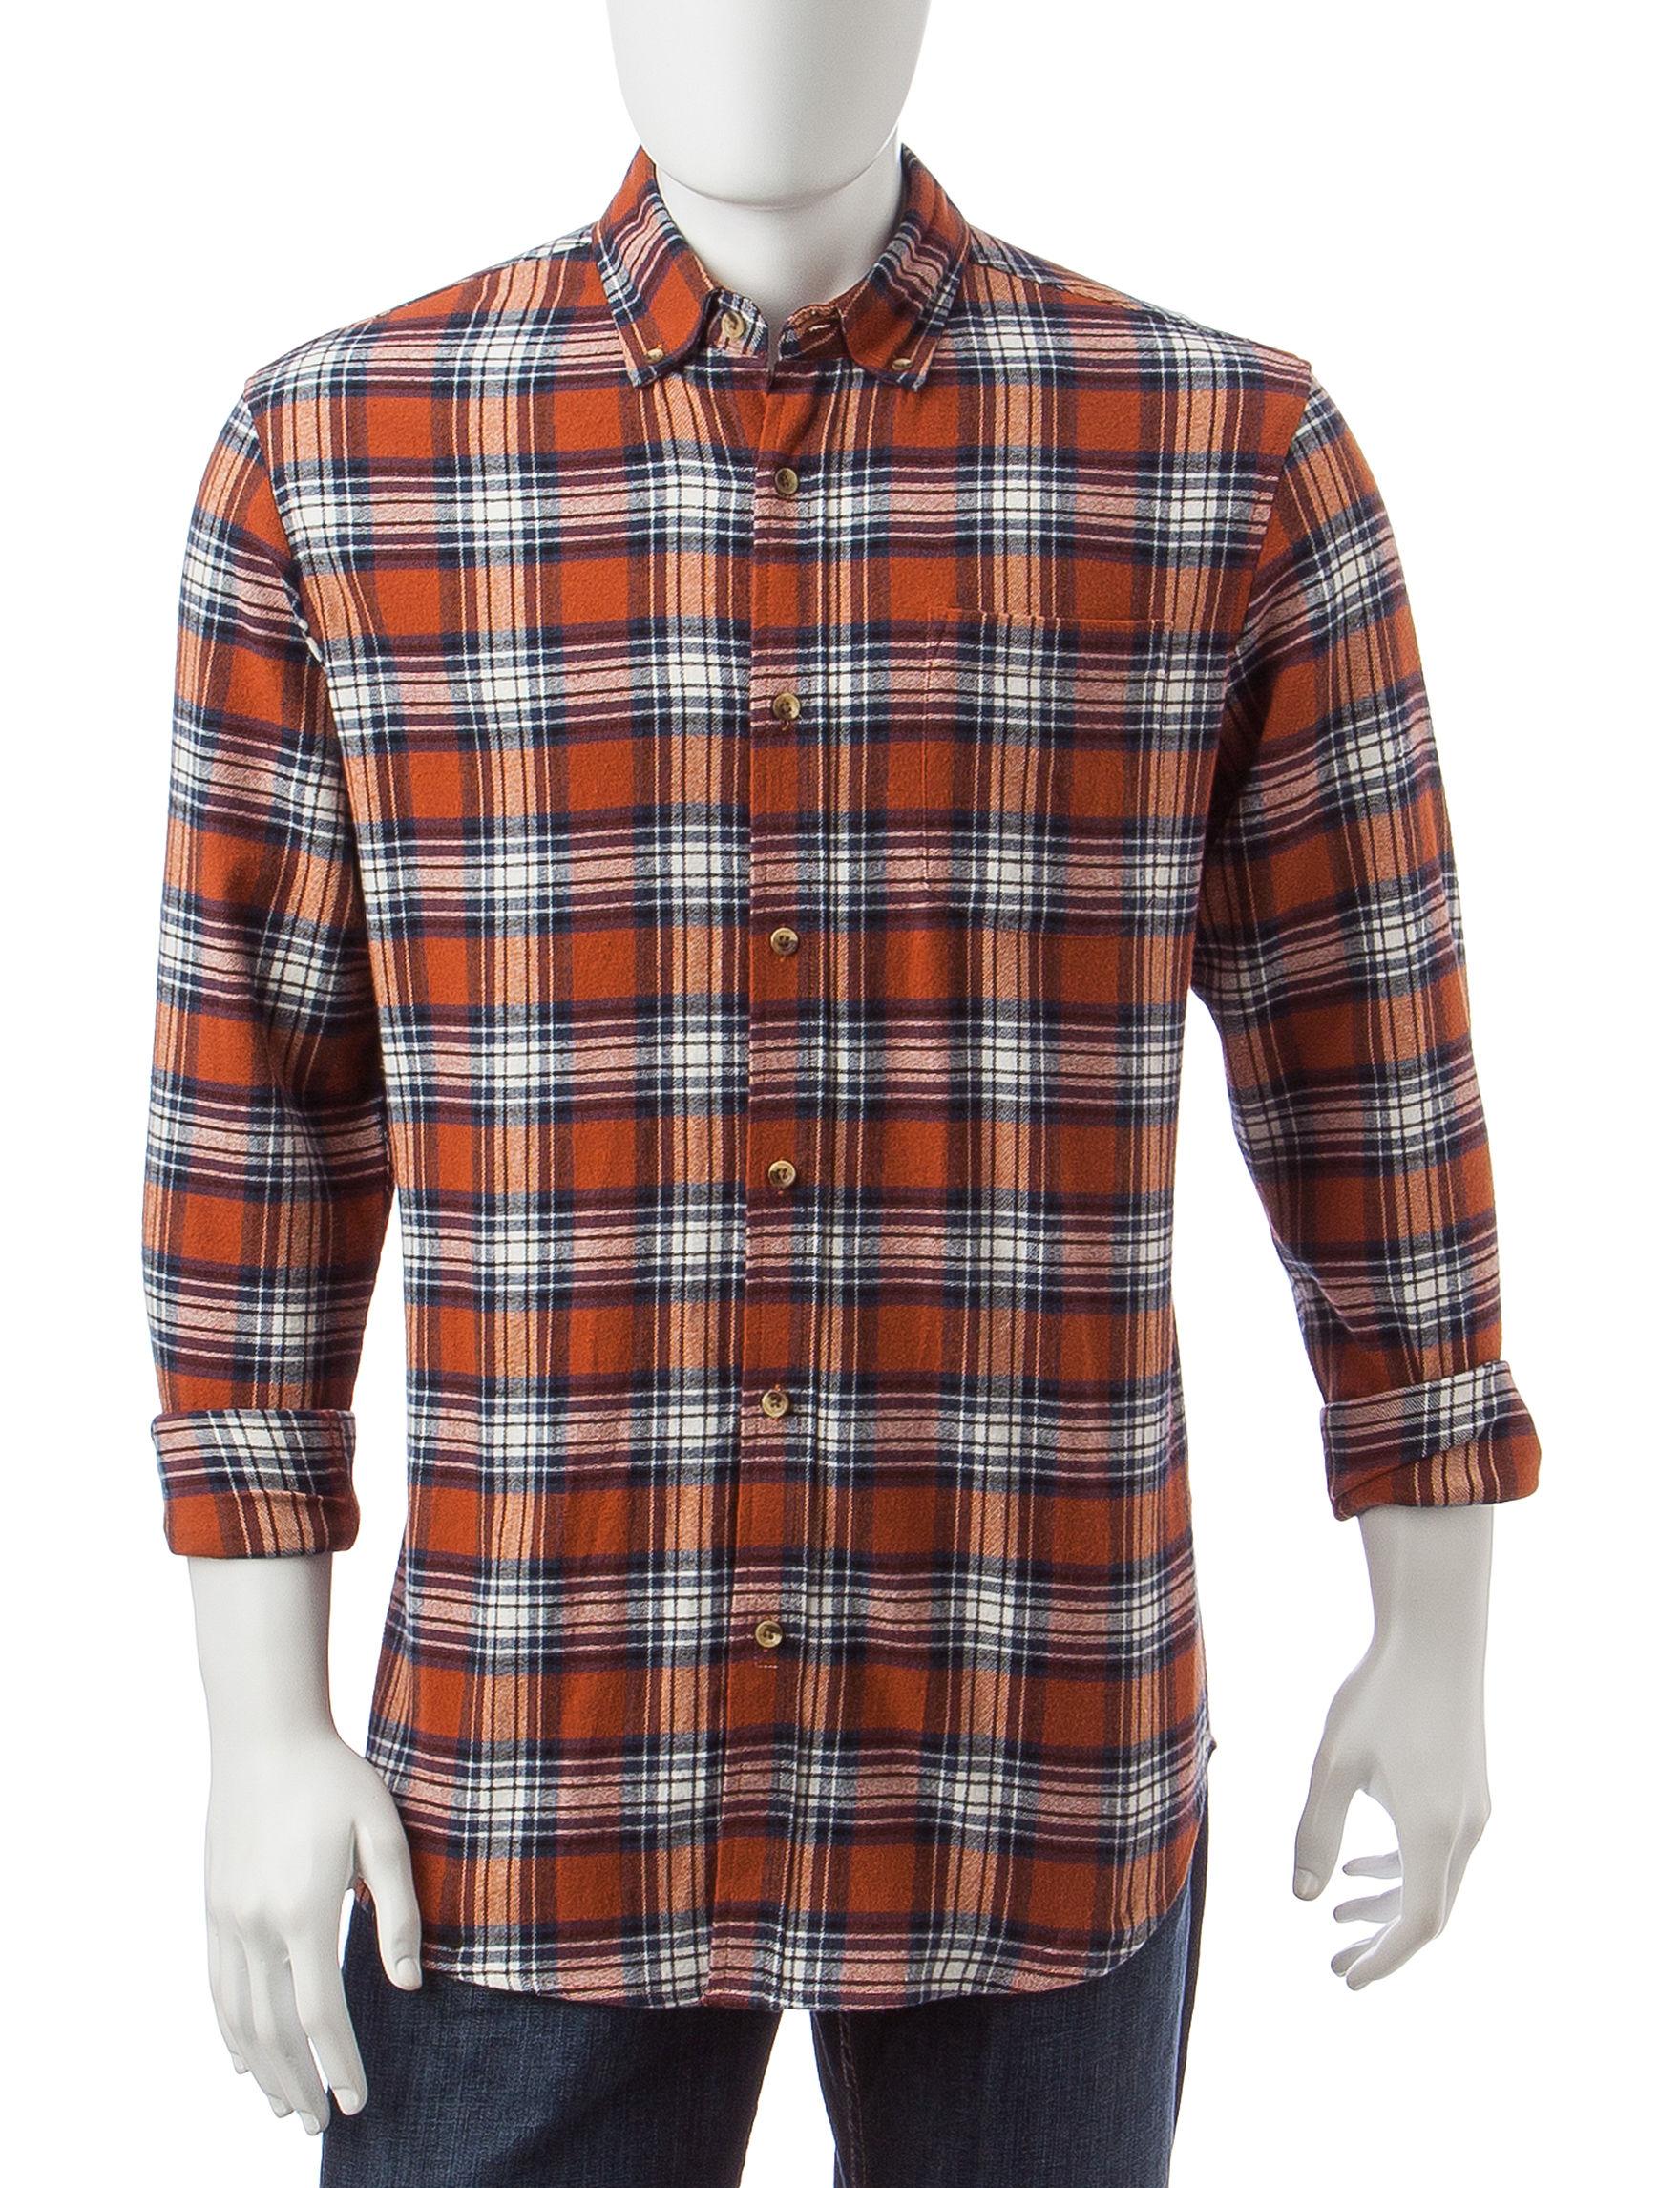 Sun River Orange Casual Button Down Shirts